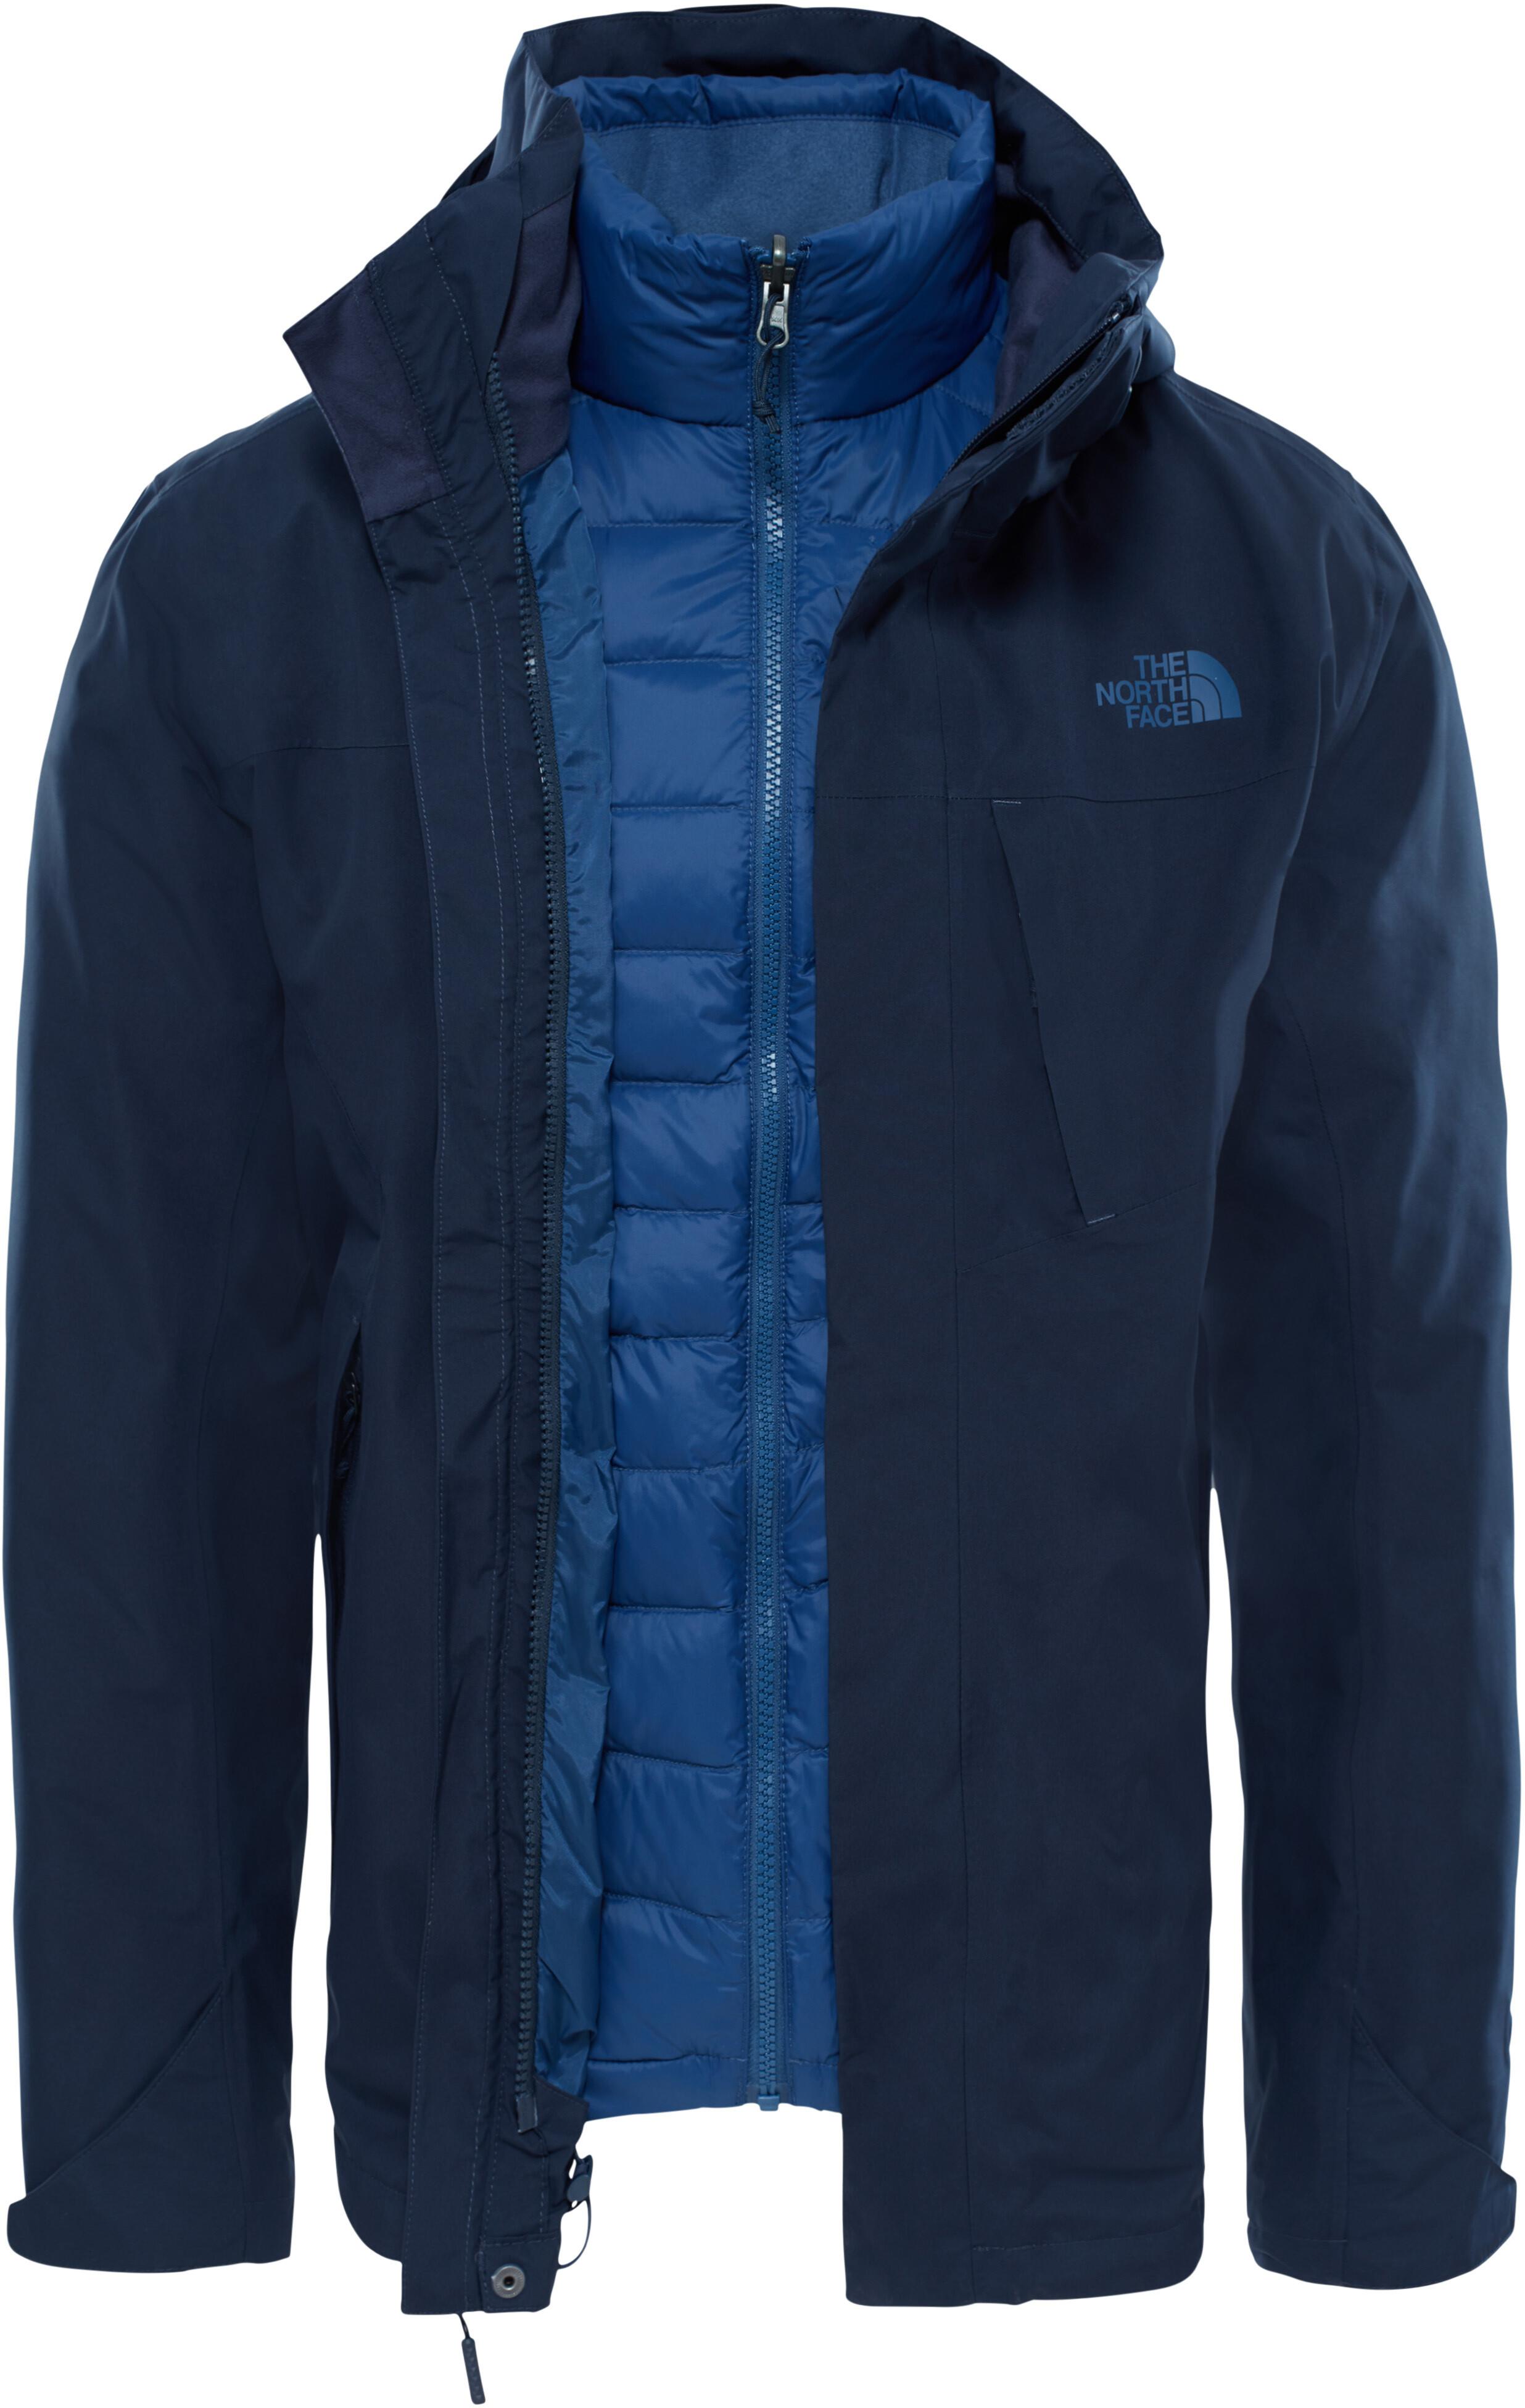 the north face mountain light veste homme bleu sur campz. Black Bedroom Furniture Sets. Home Design Ideas